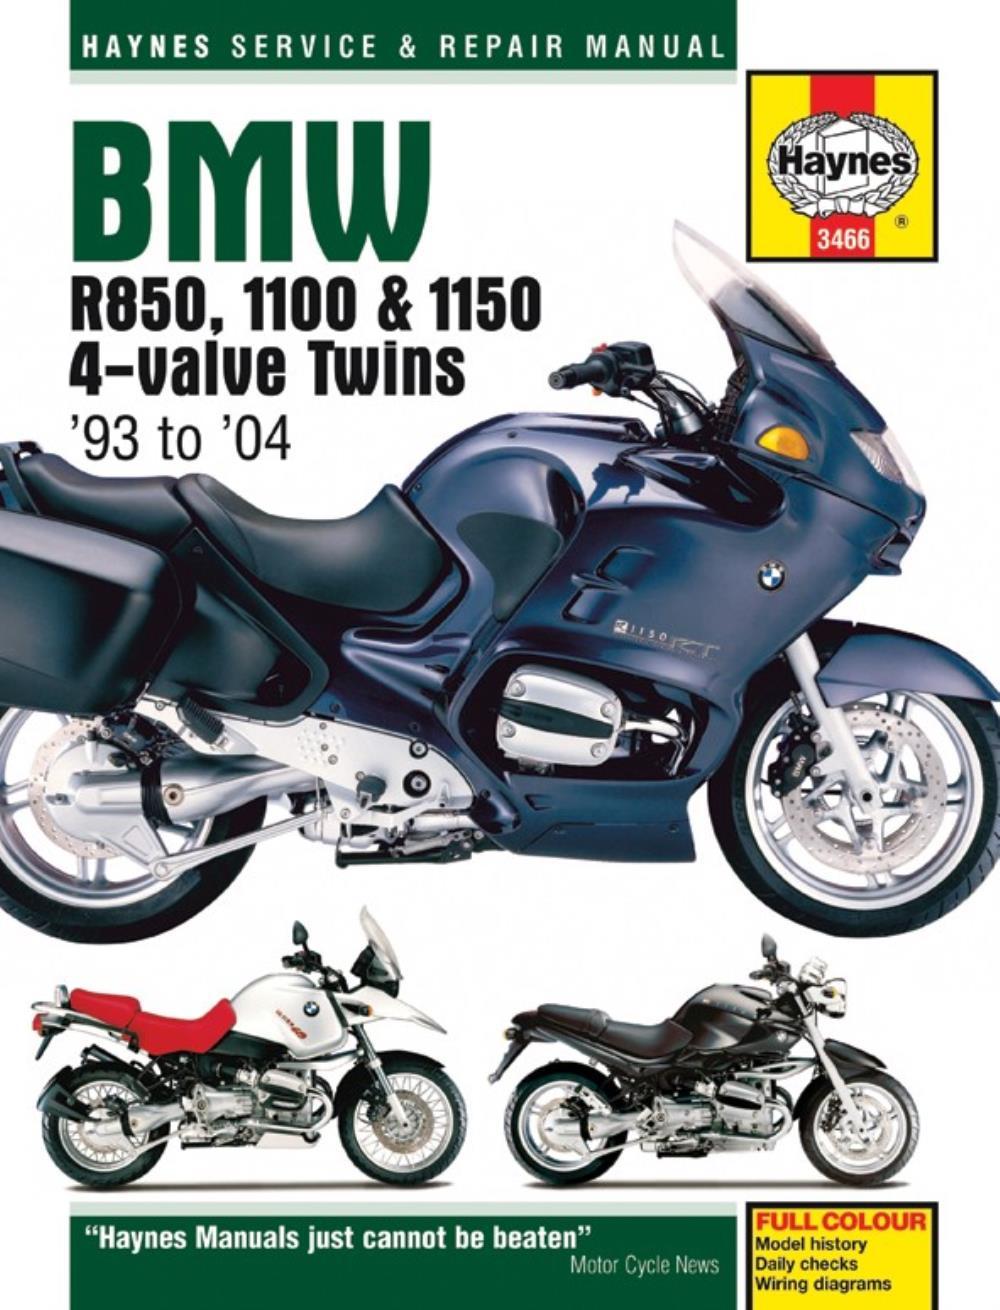 Manual Haynes for 1998 BMW R 1100 S